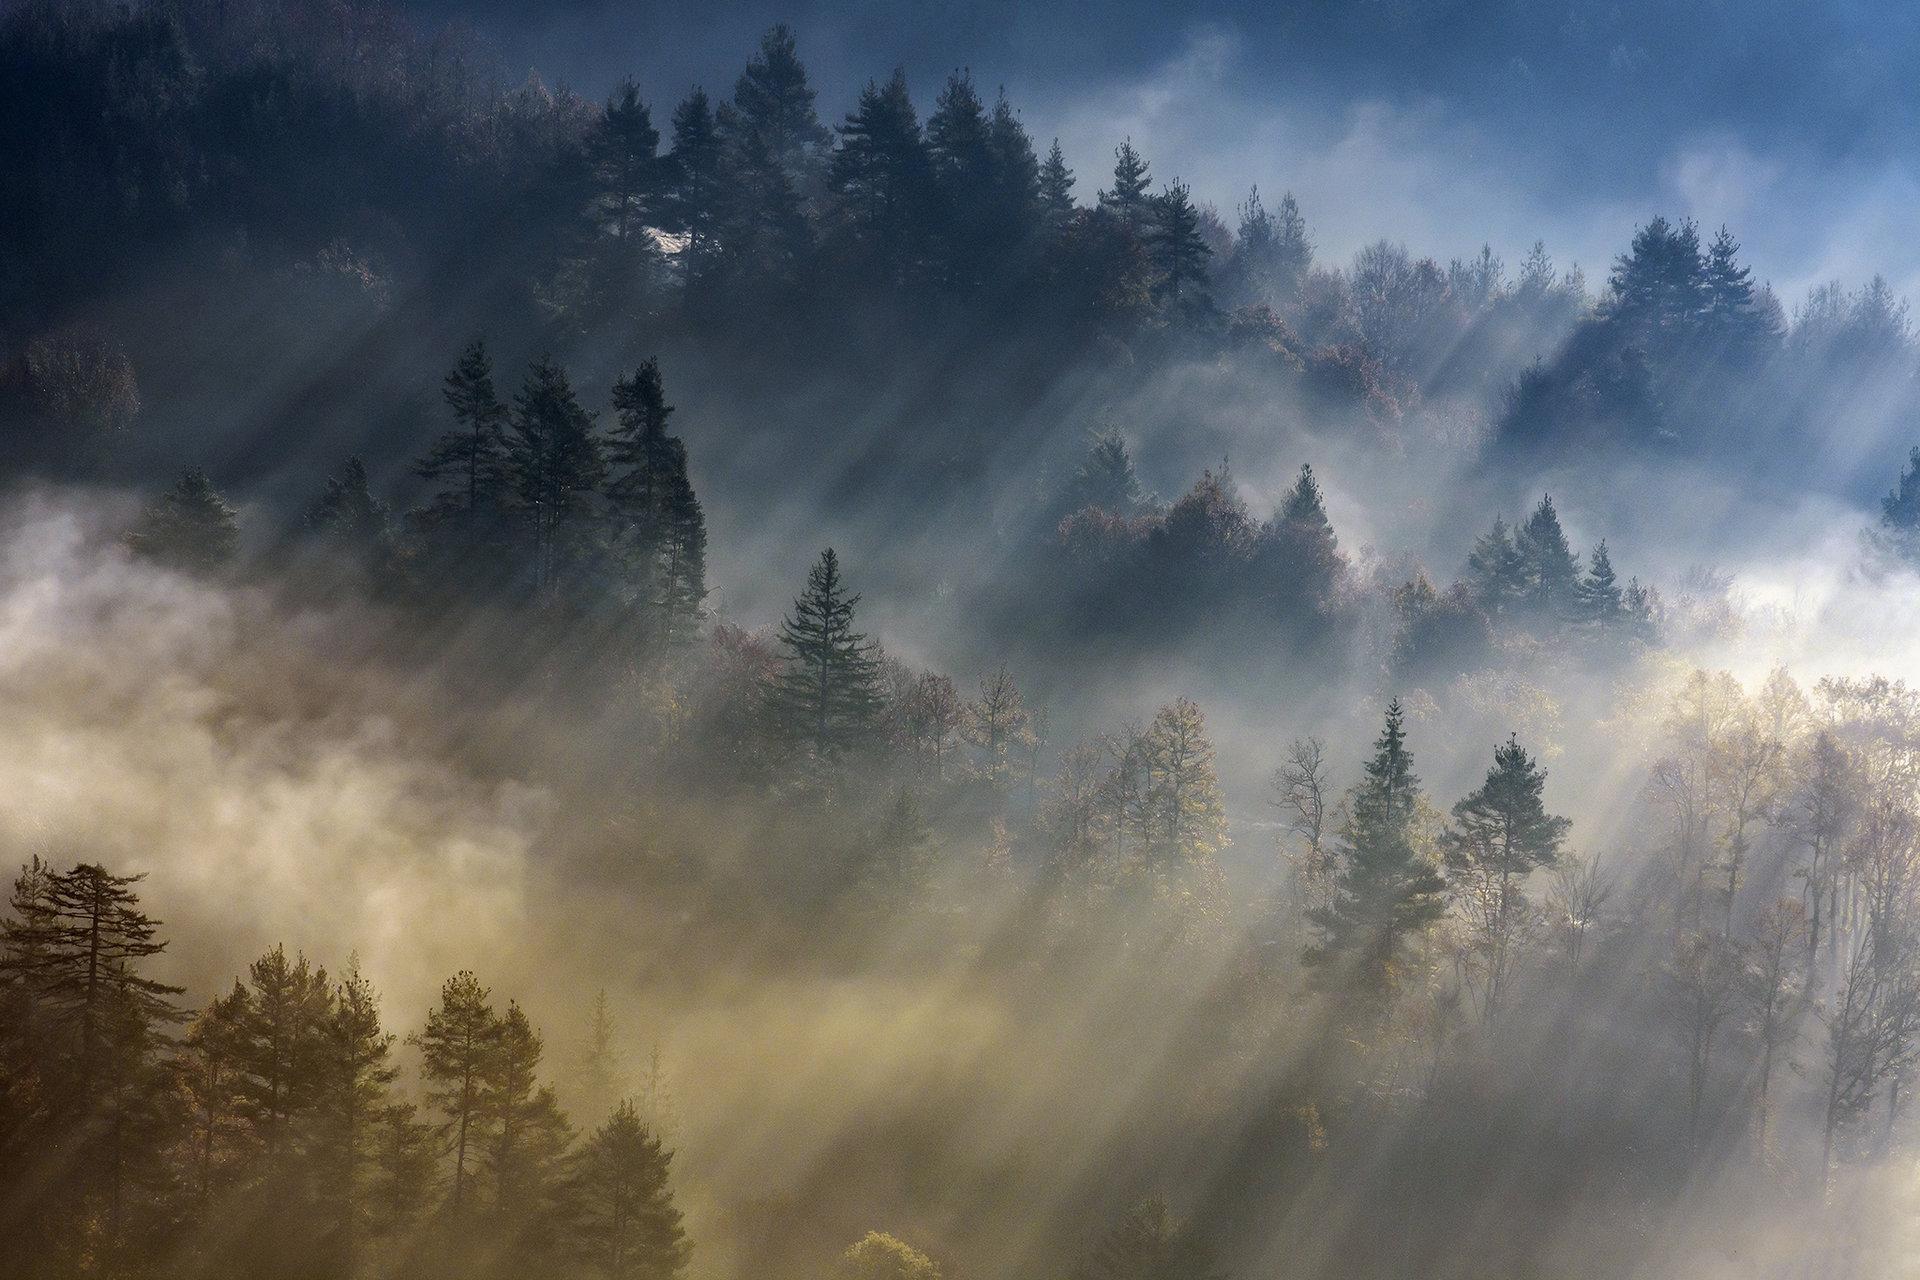 Photo in Landscape | Author Plamen Petkov - Jacko | PHOTO FORUM